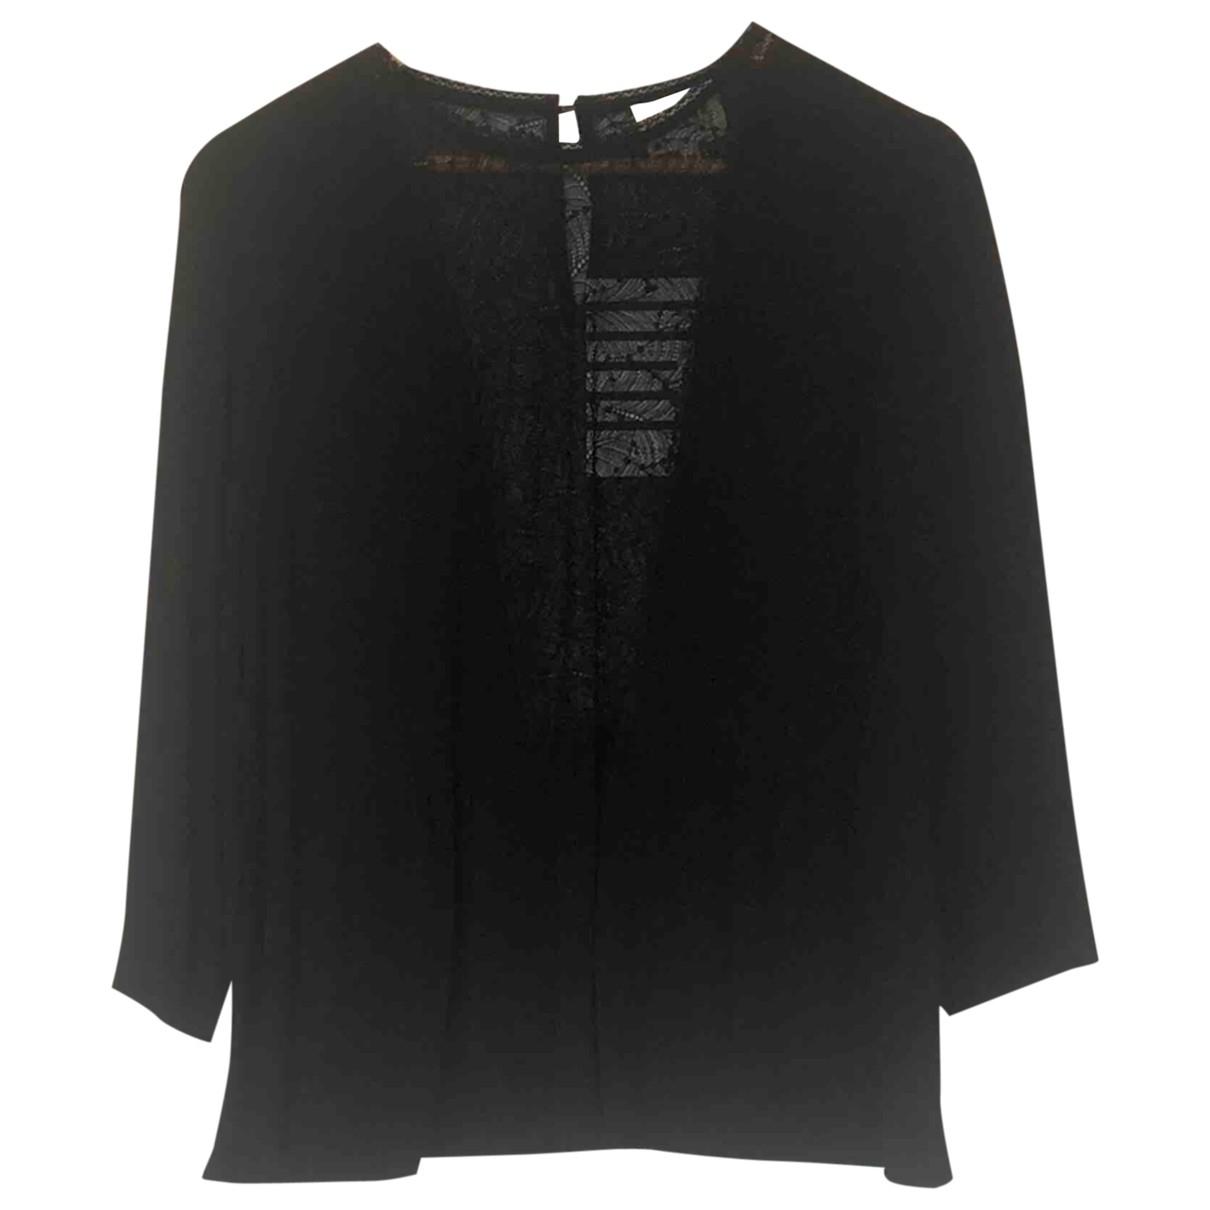 Sézane \N Black  top for Women 34 FR